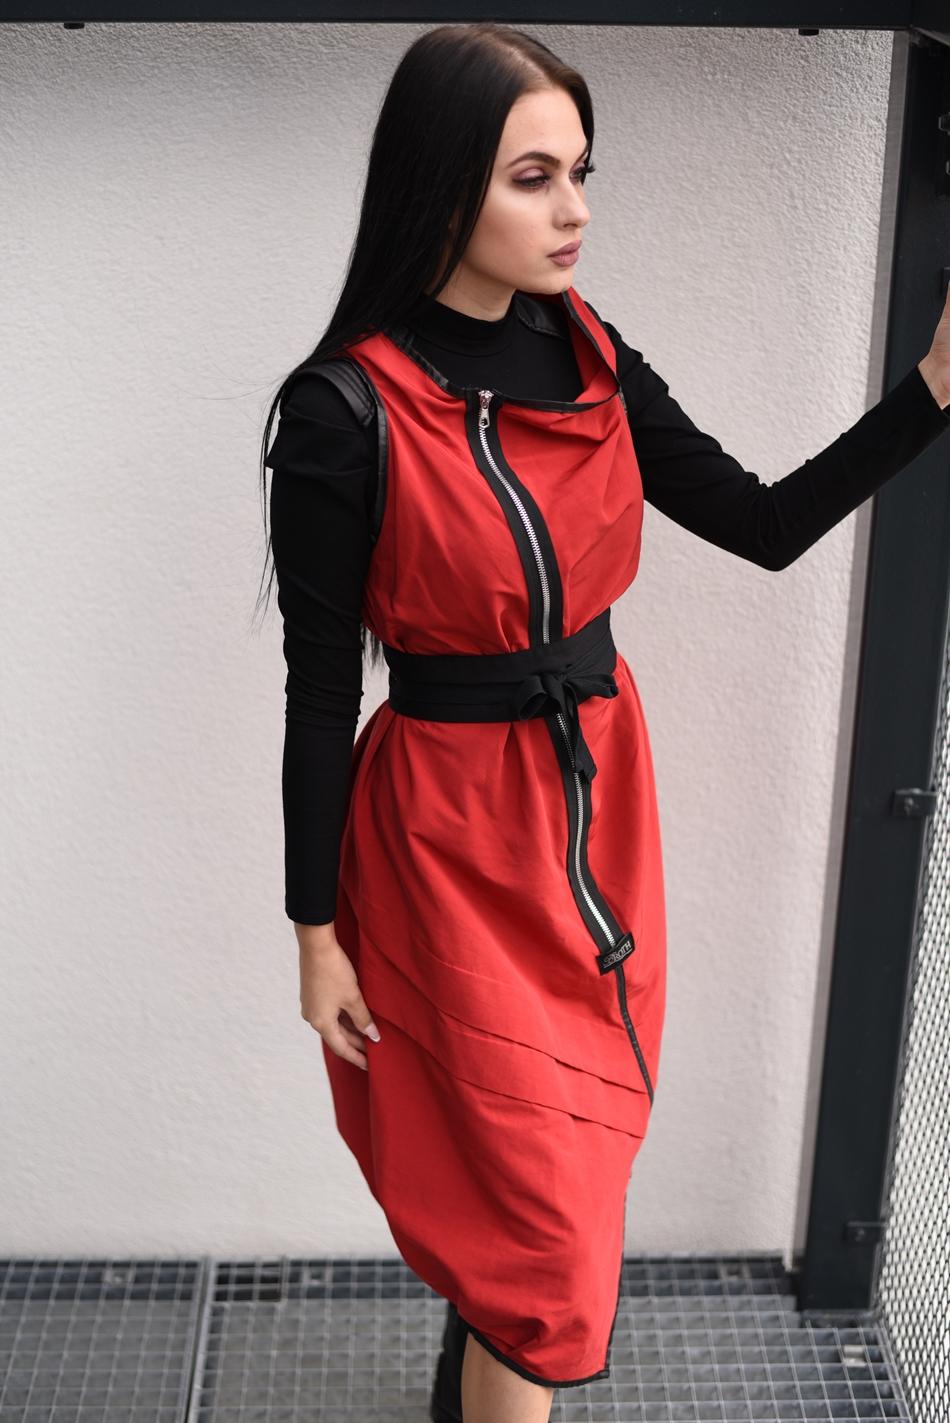 Broth_design_clothes_035